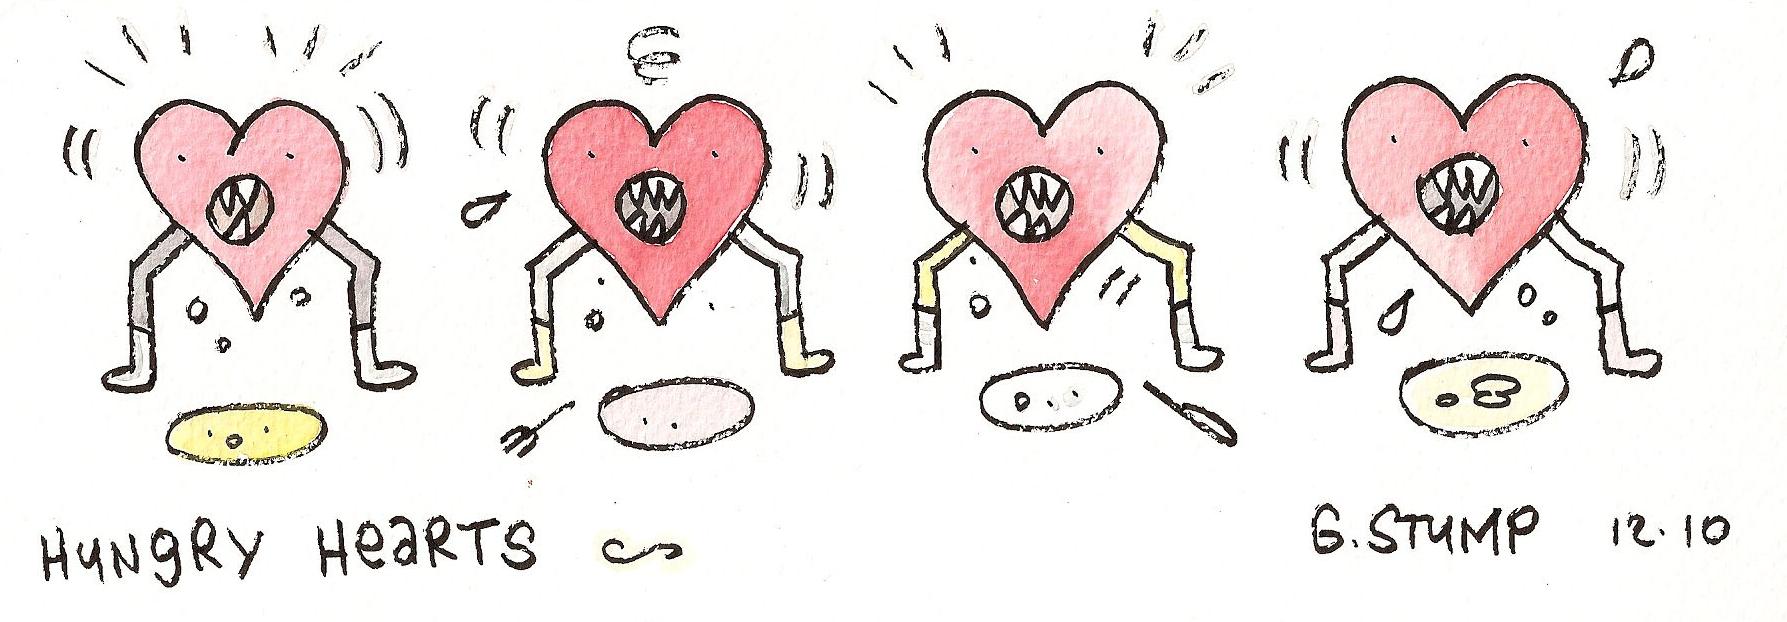 hungryhearts.jpg